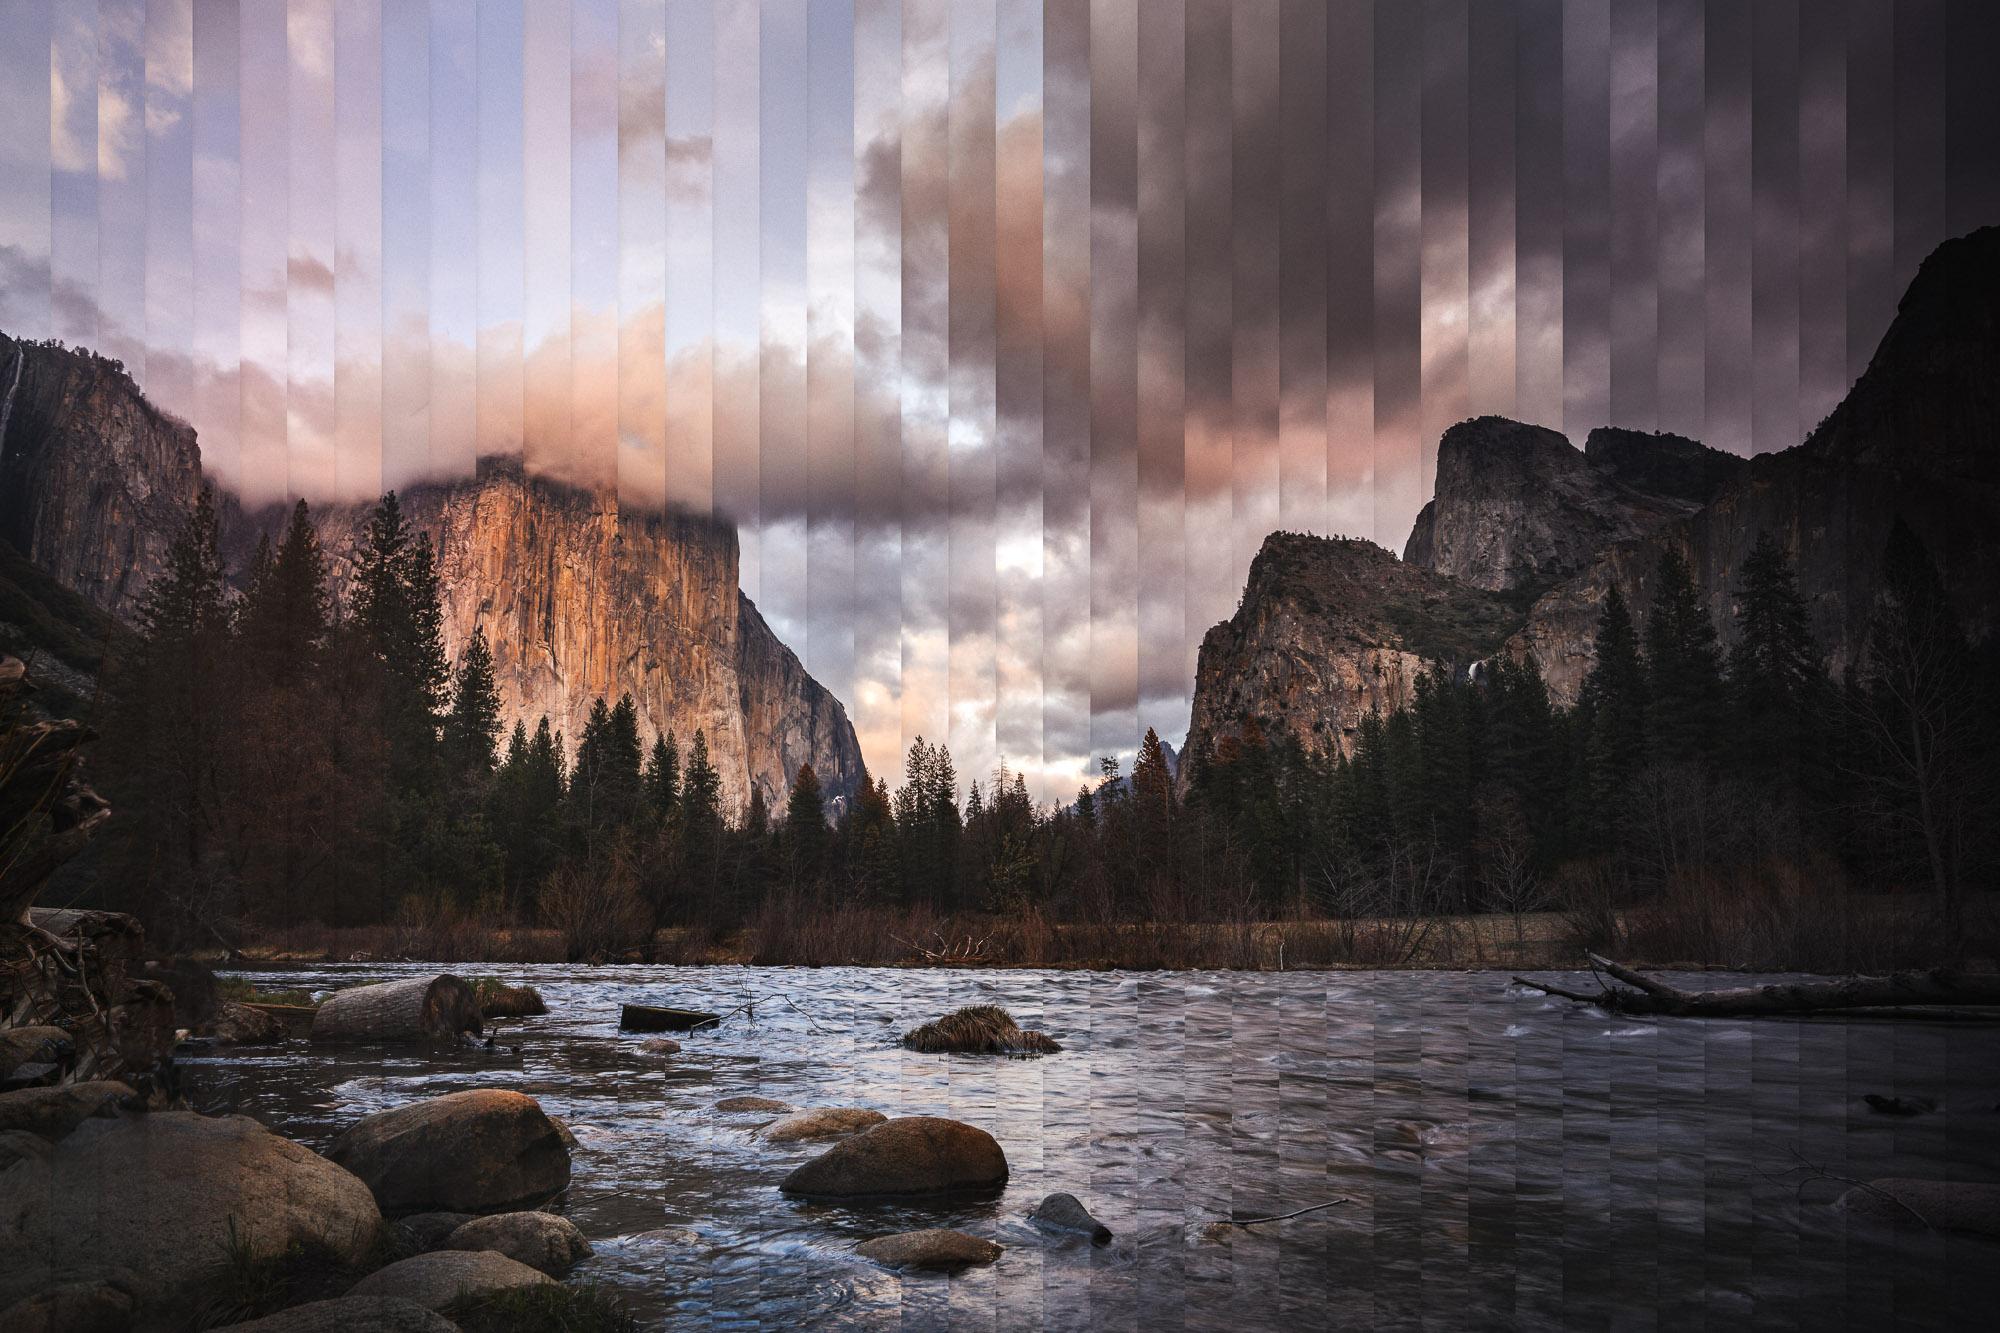 Timeslice Yosemite in 35 photos